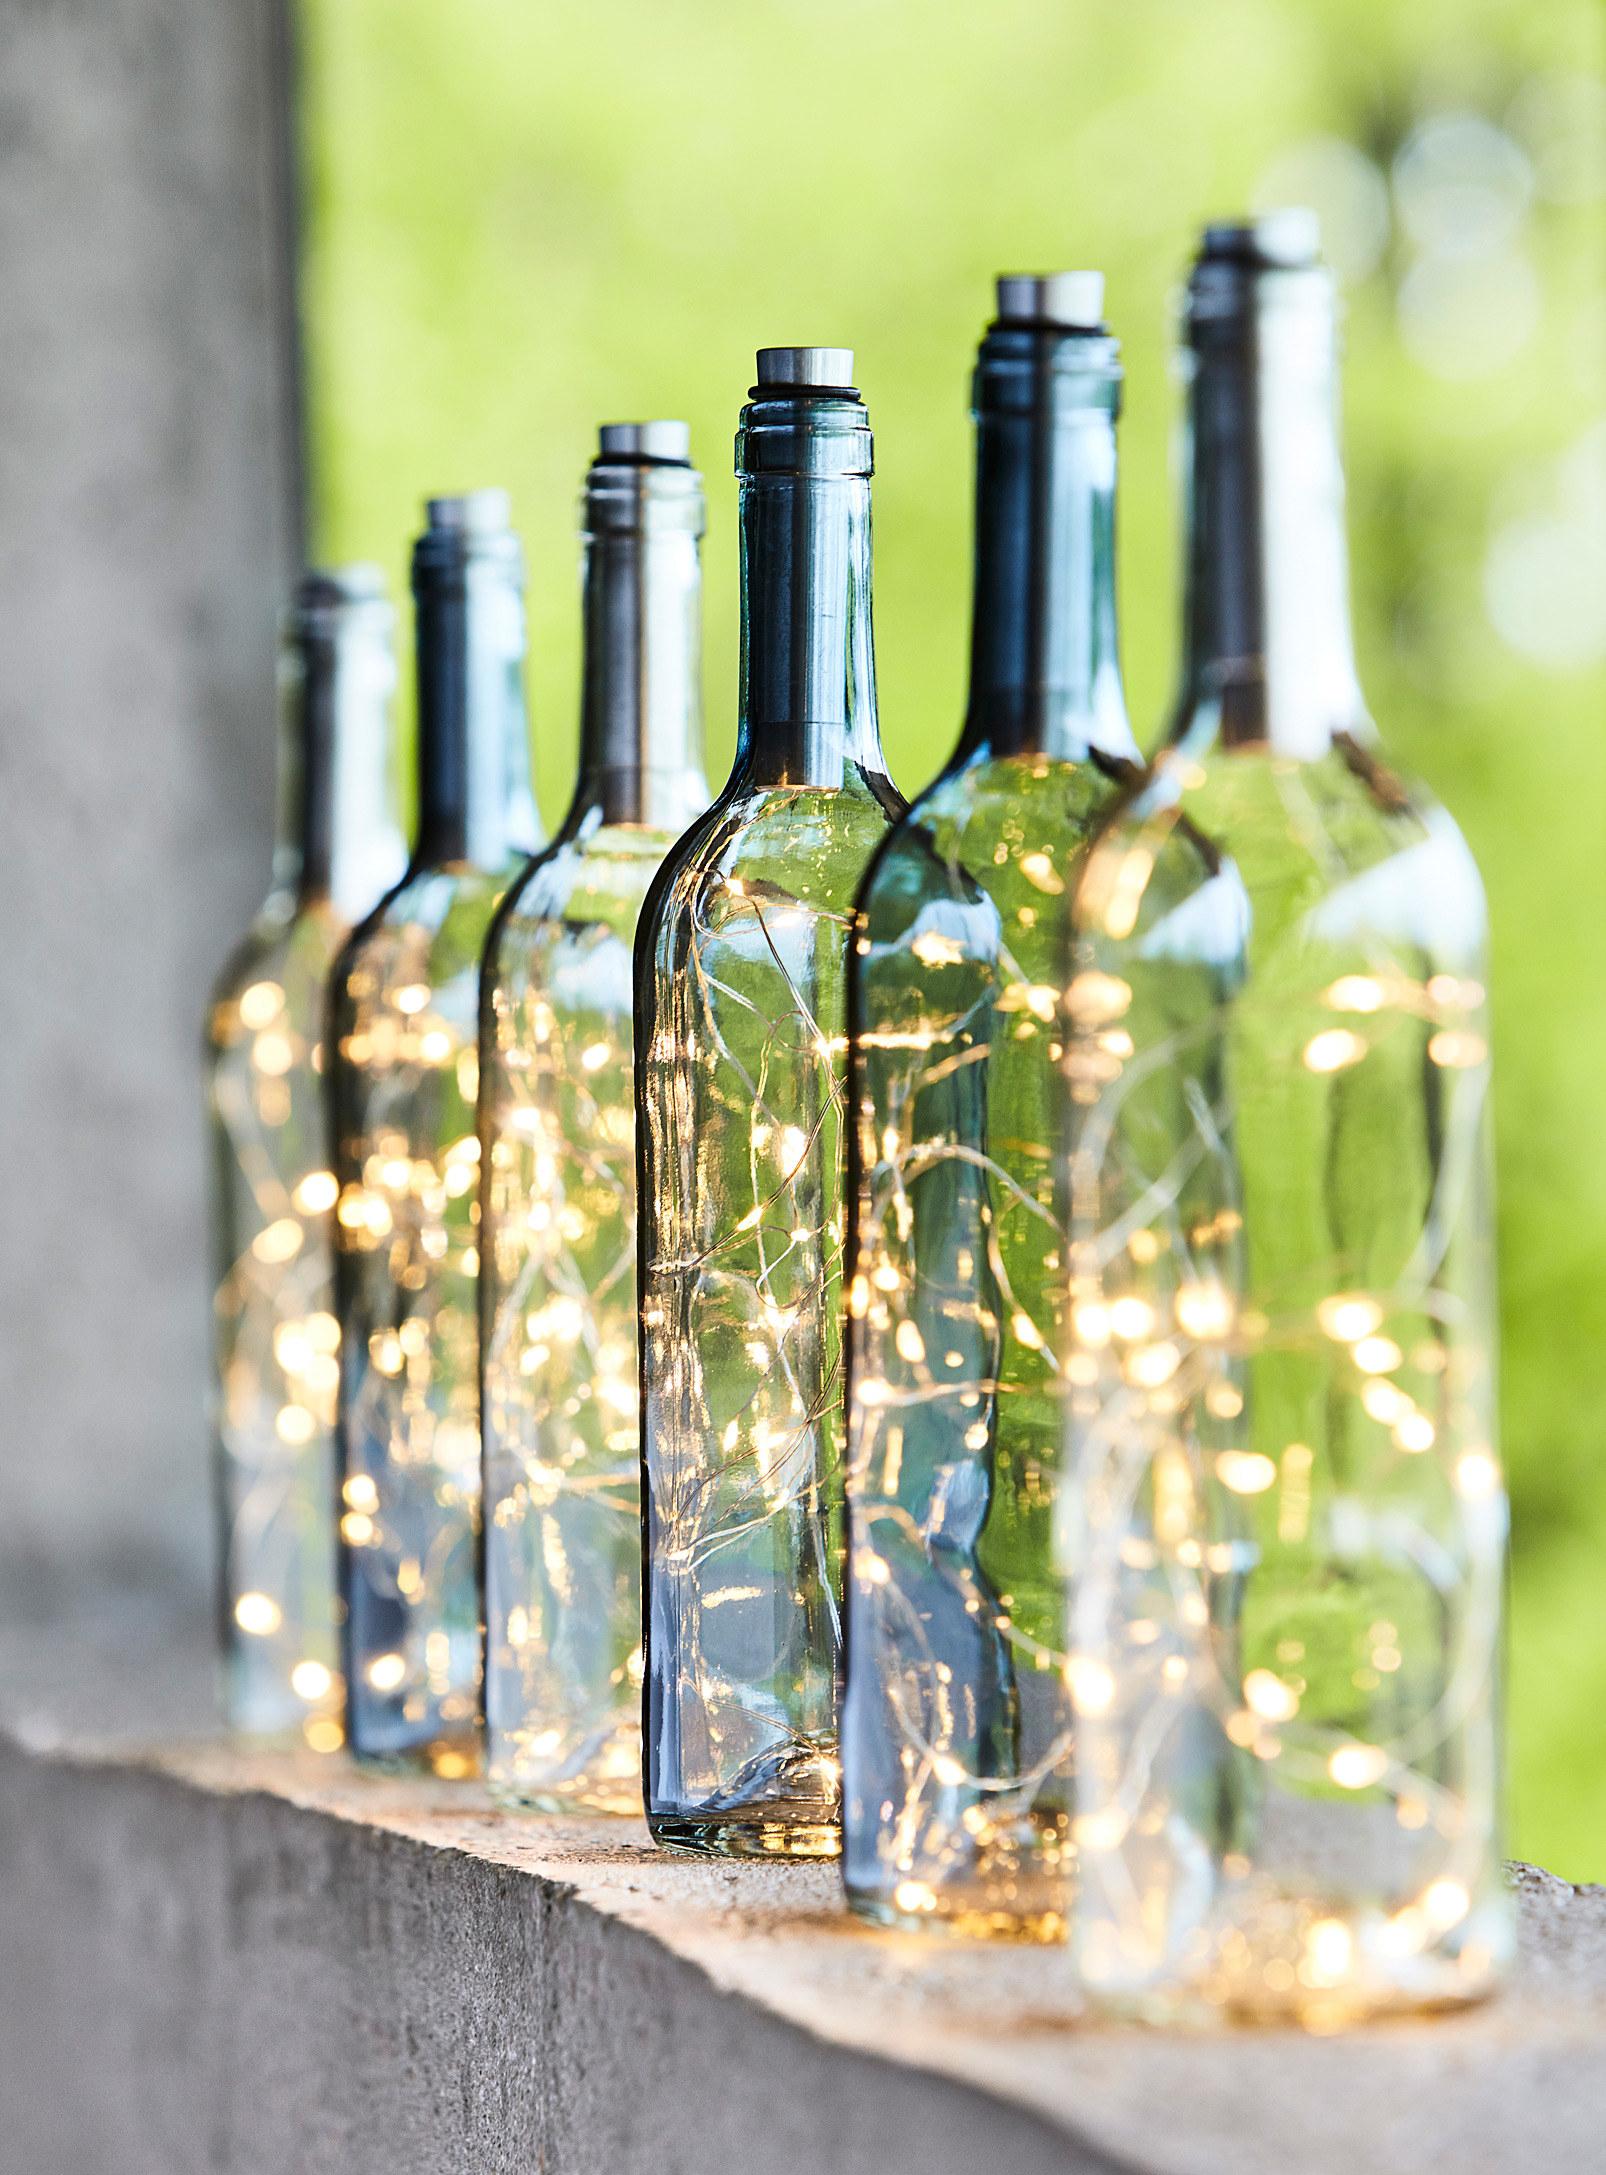 Six glass bottle lanterns sitting in a row